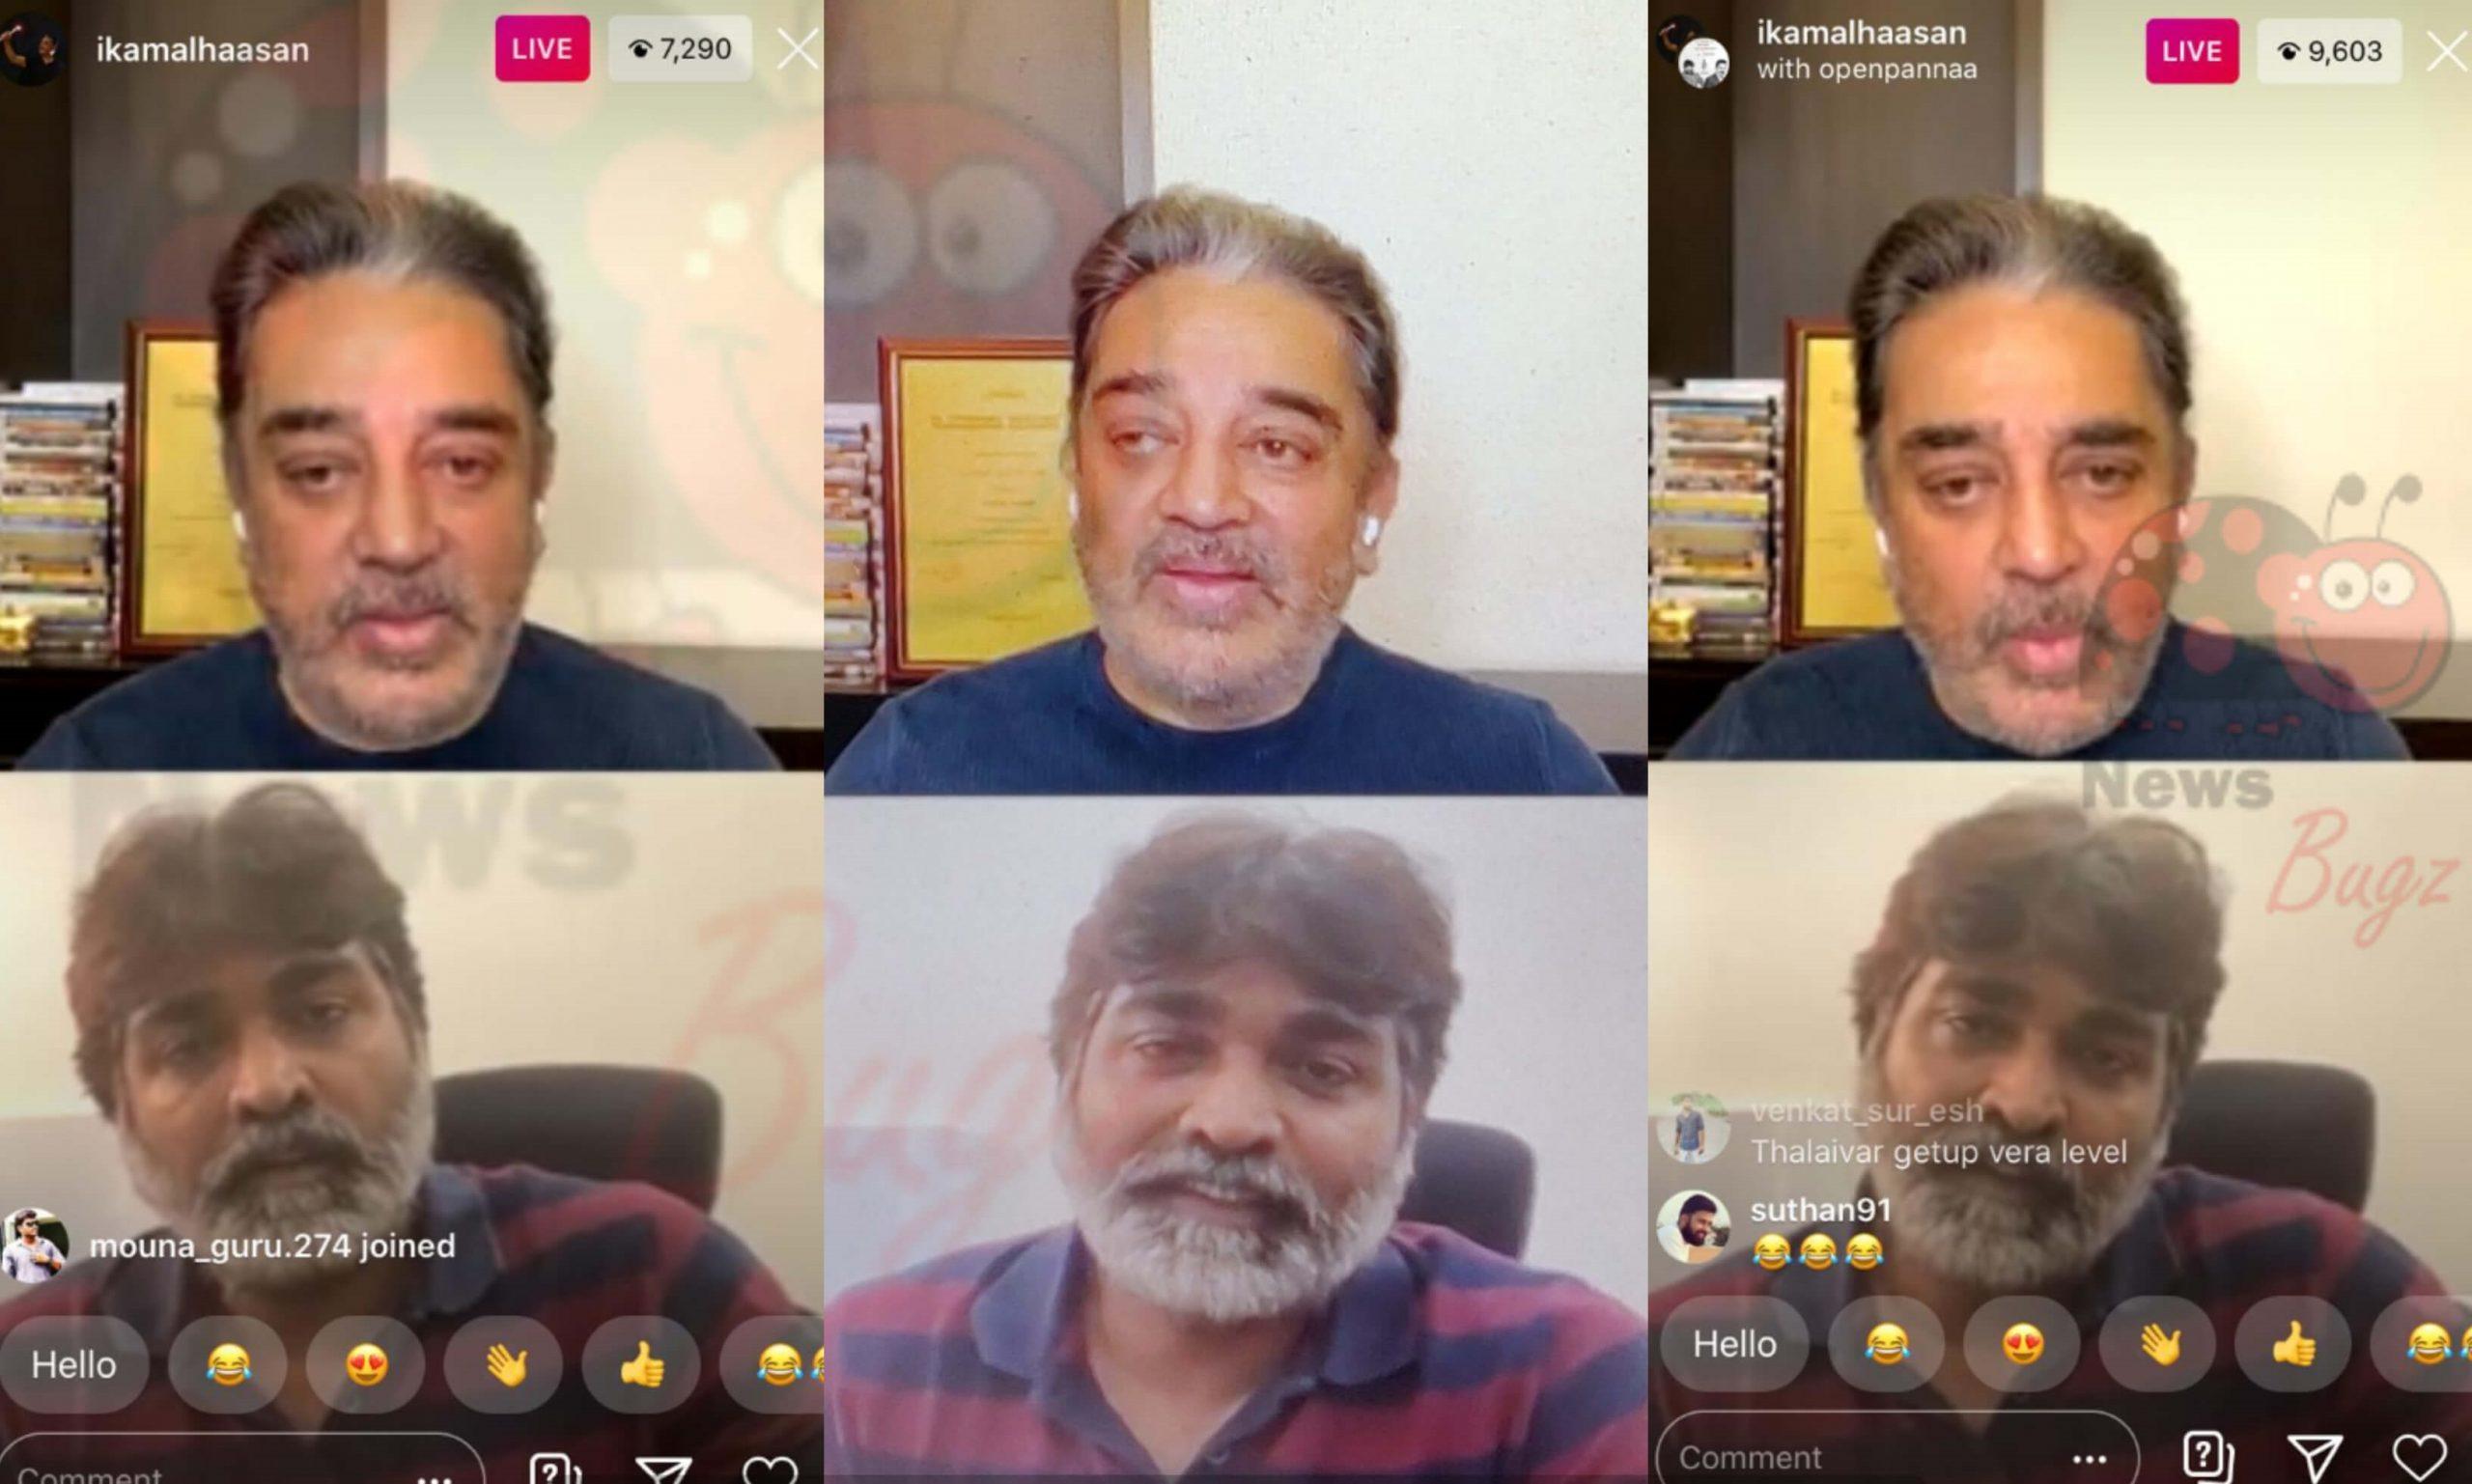 Kamal Haasan Vijay Sethupathi Instagram Live